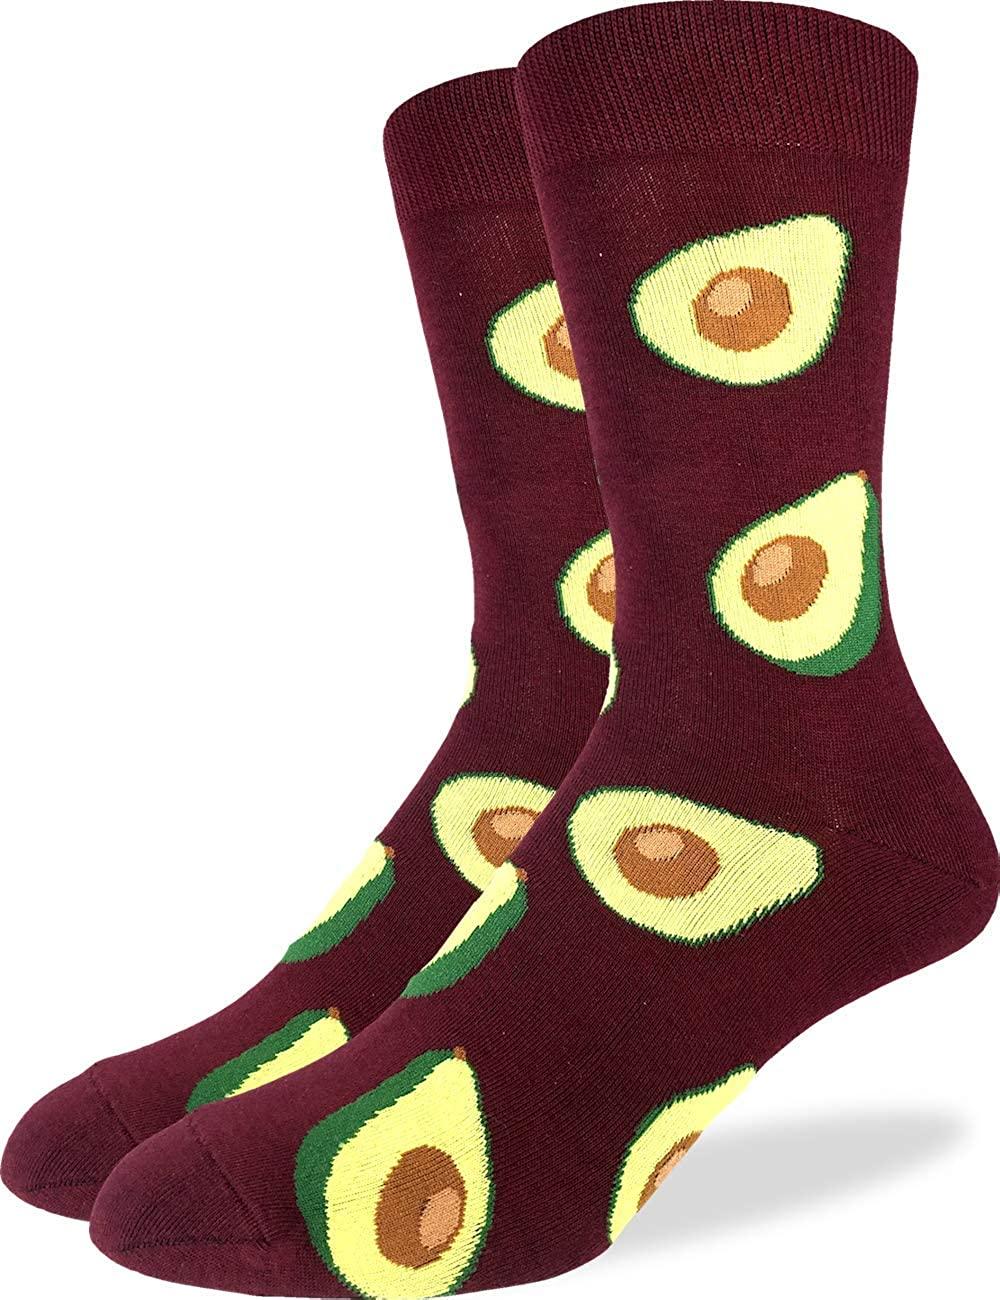 Good Luck Sock Men's Red Avocado Socks - Red, Adult Shoe Size 7-12